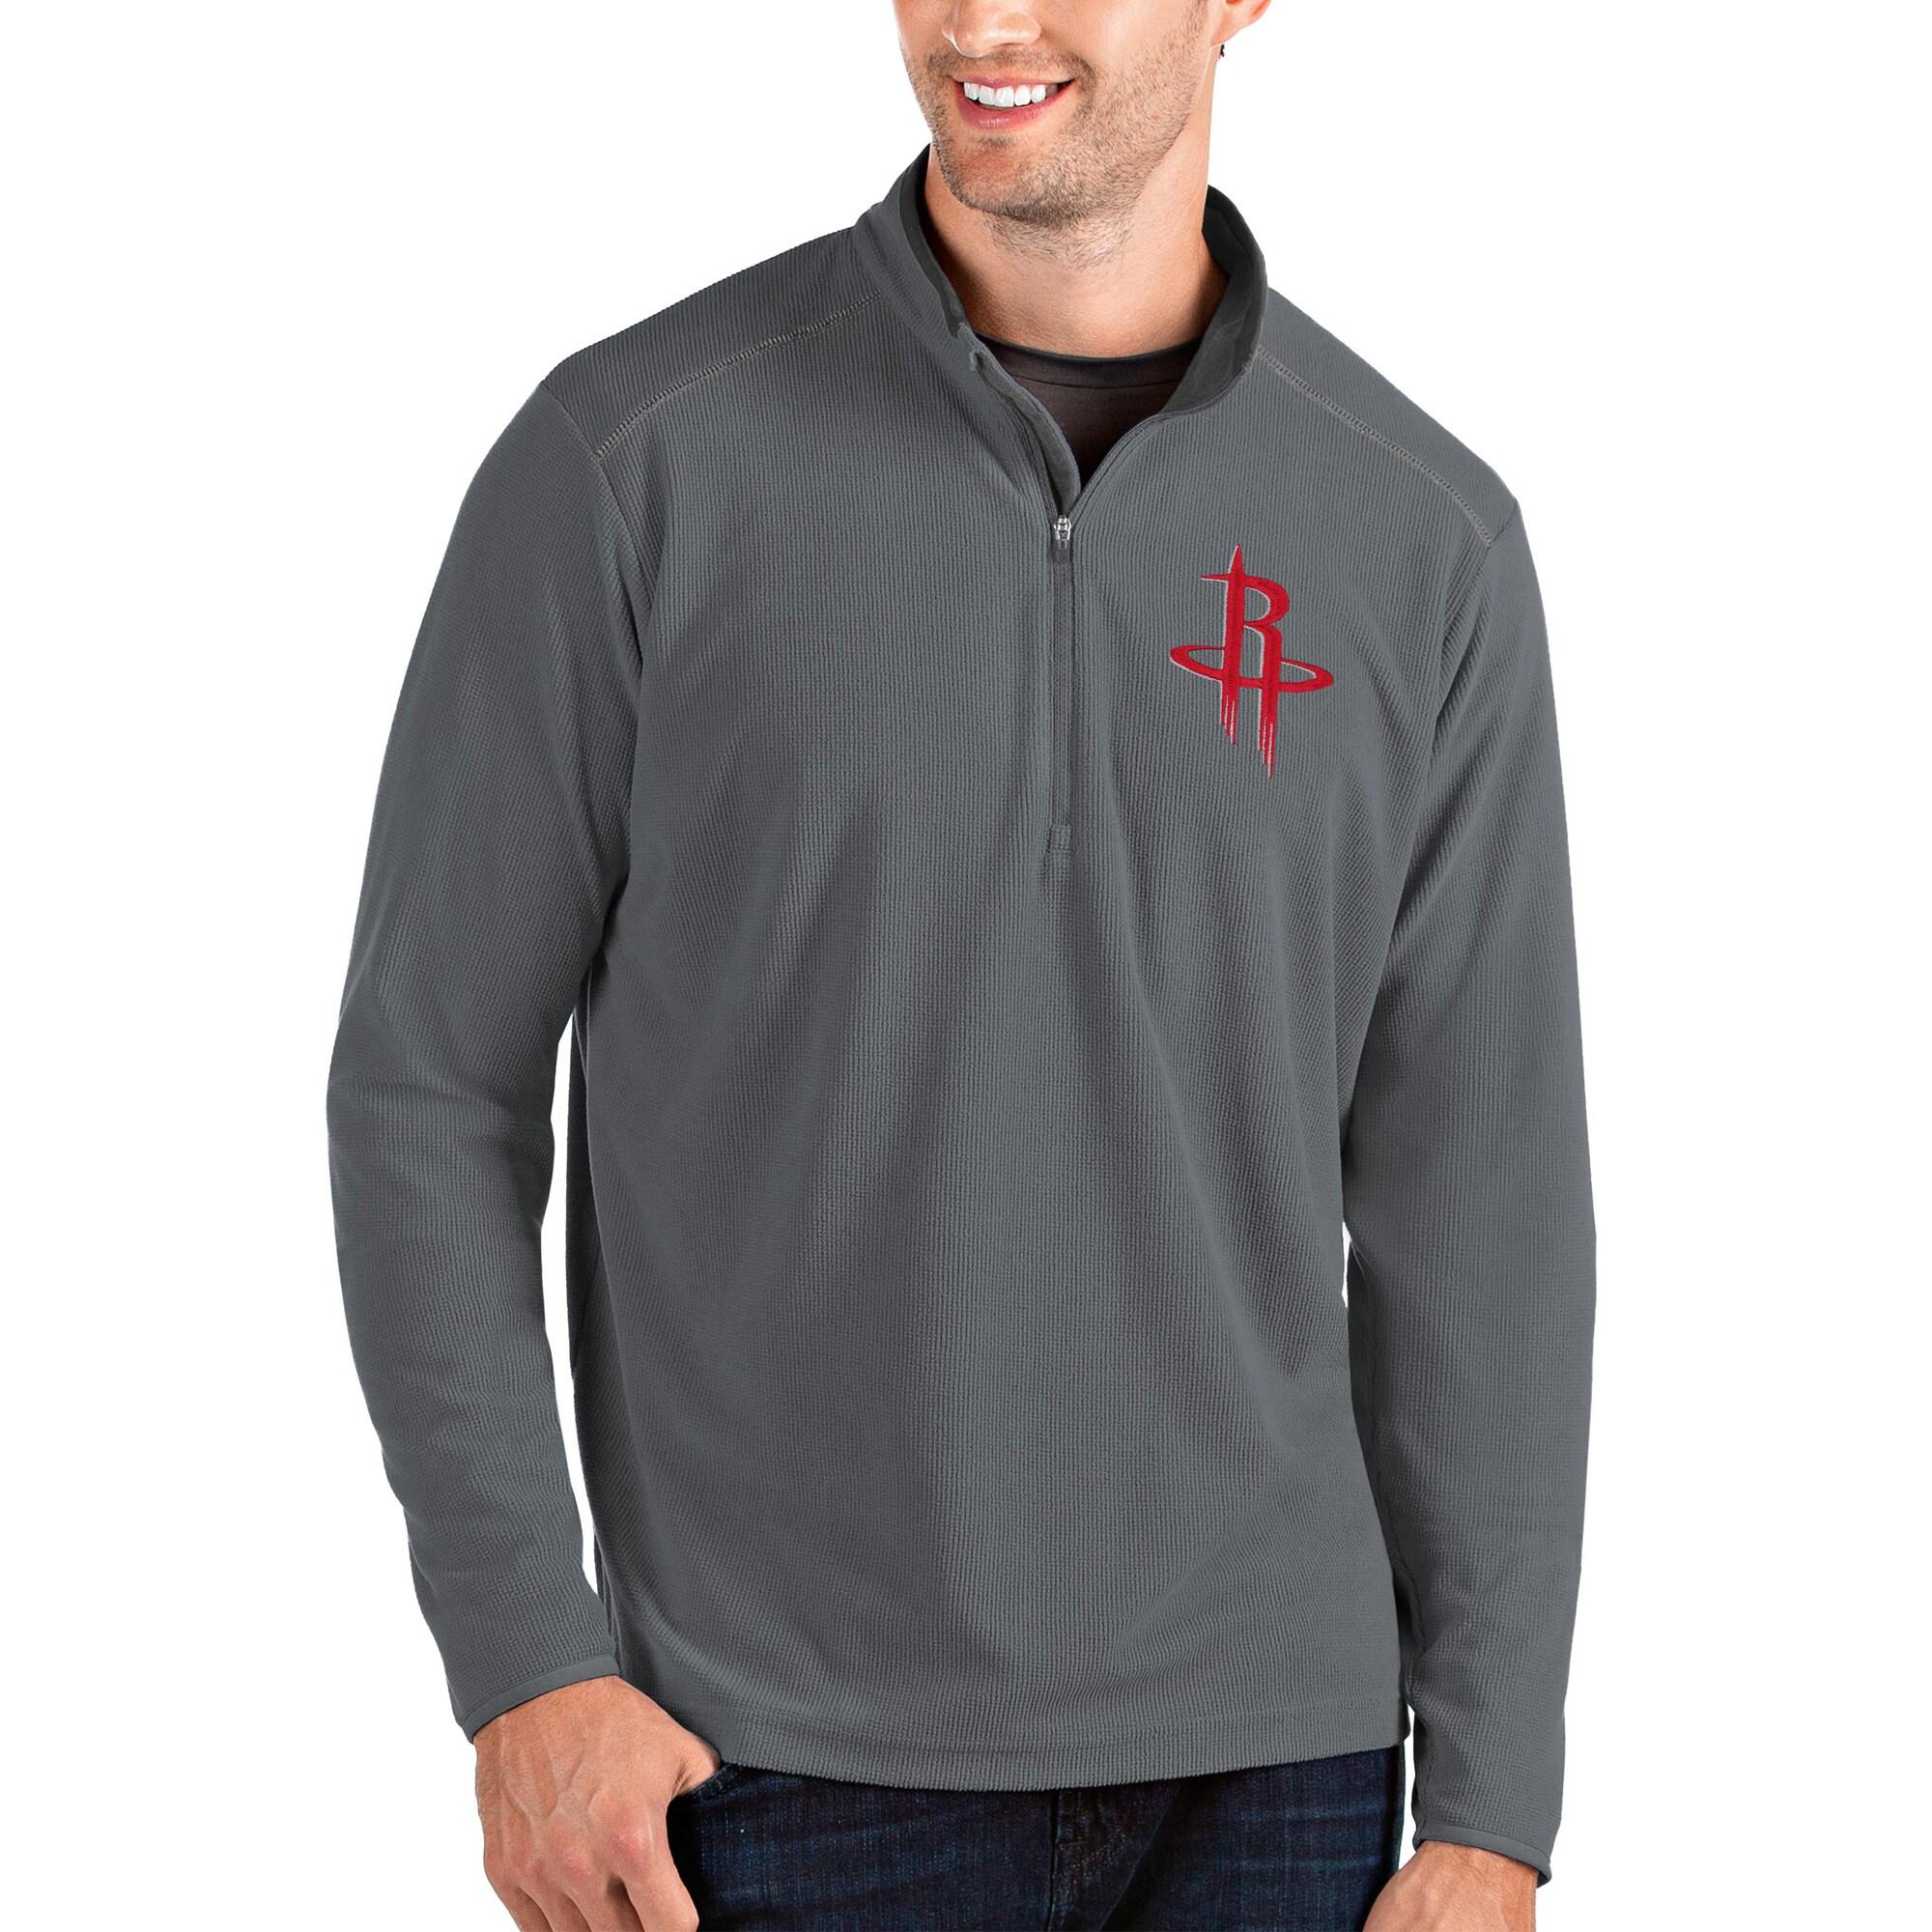 Houston Rockets Antigua Glacier Quarter-Zip Pullover Jacket - Charcoal/Gray